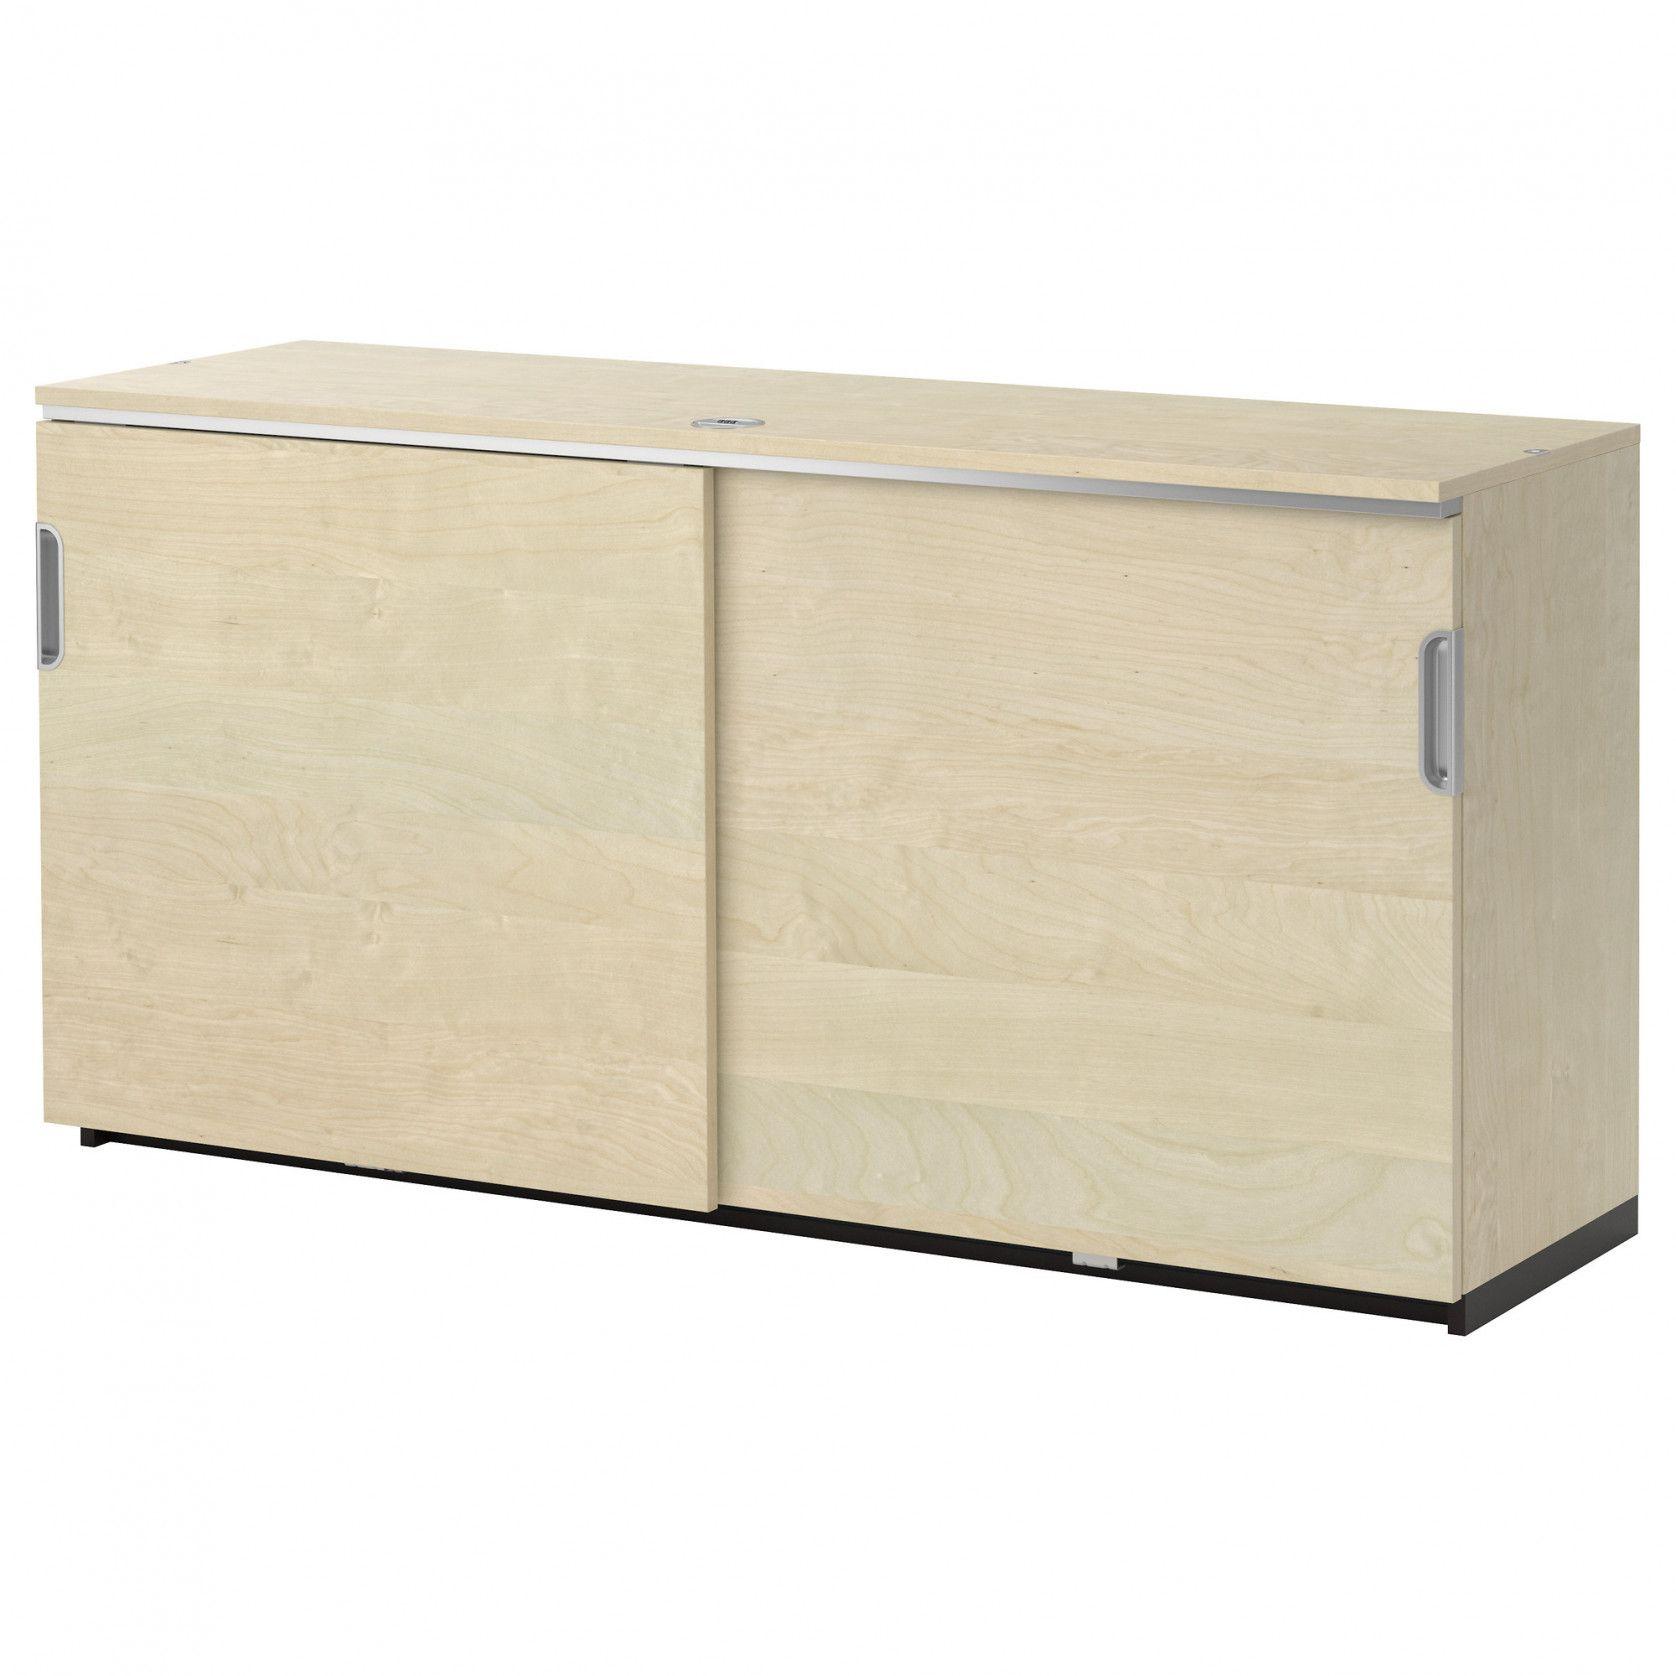 cheap office storage. 2019 Cheap Office Storage Cabinets - Backsplash For Kitchen Ideas Check More At Http:/